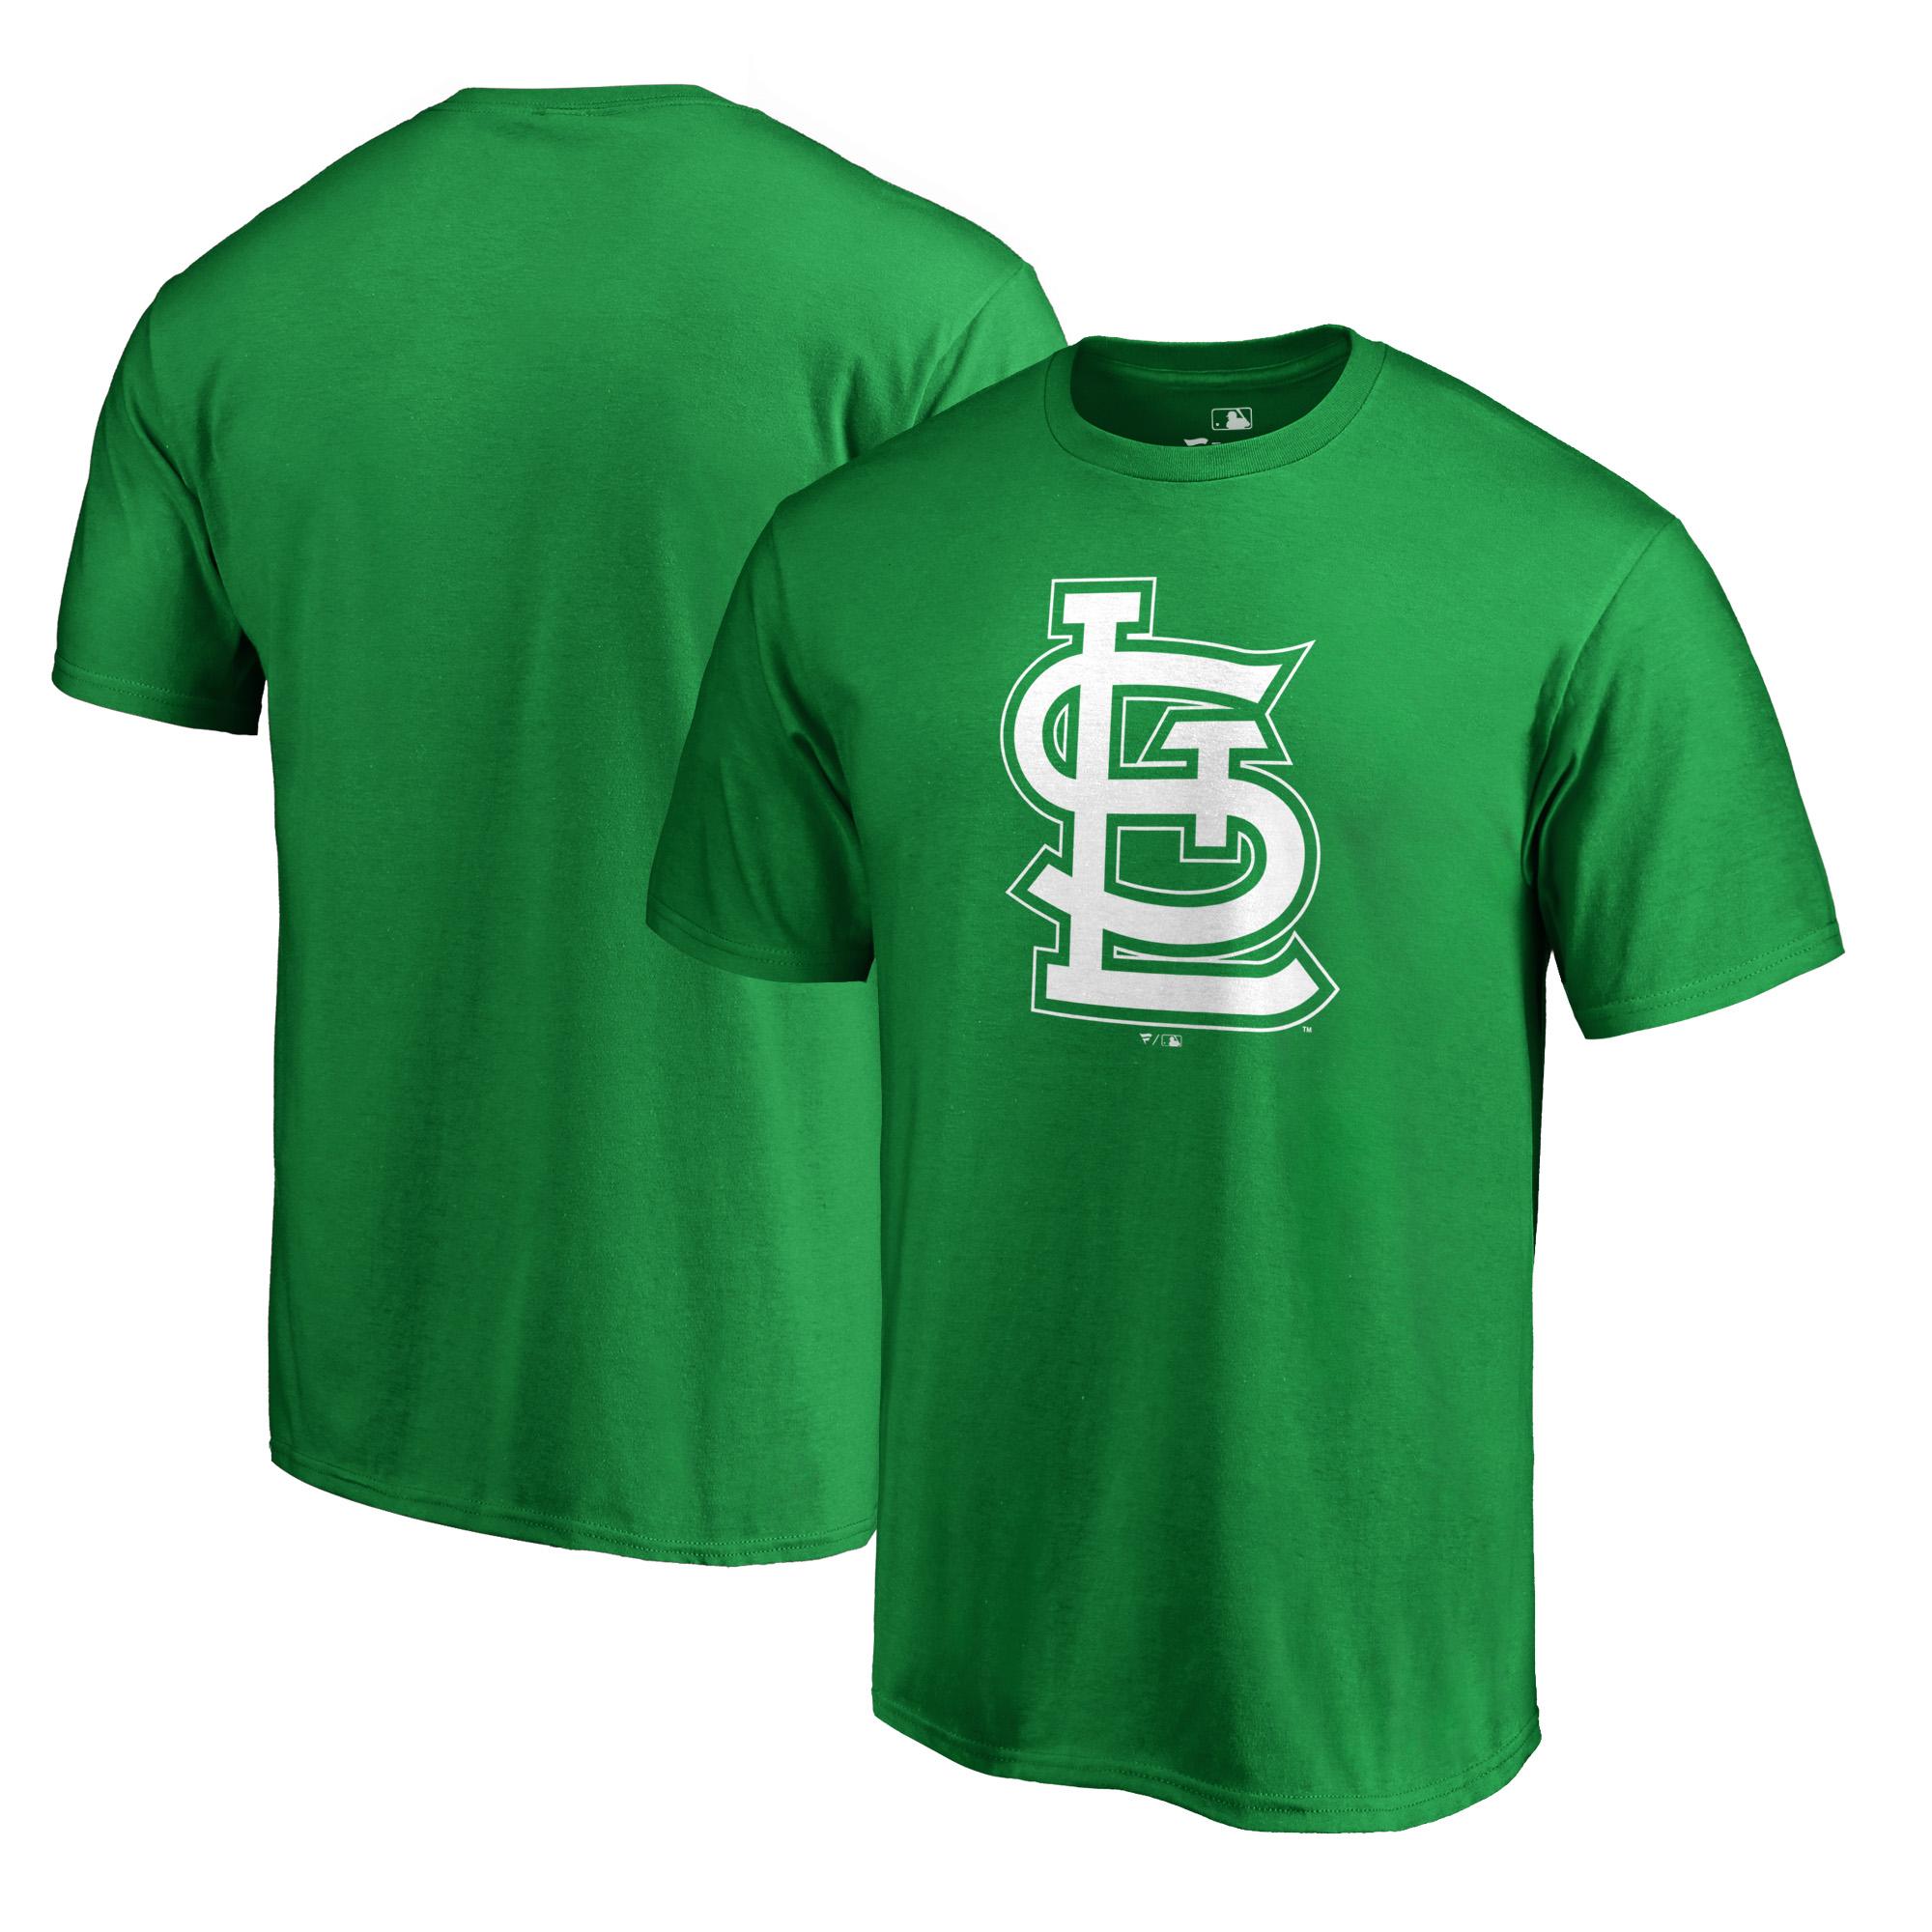 St. Louis Cardinals Fanatics Branded St. Patrick's Day White Logo Big & Tall T-Shirt - Green